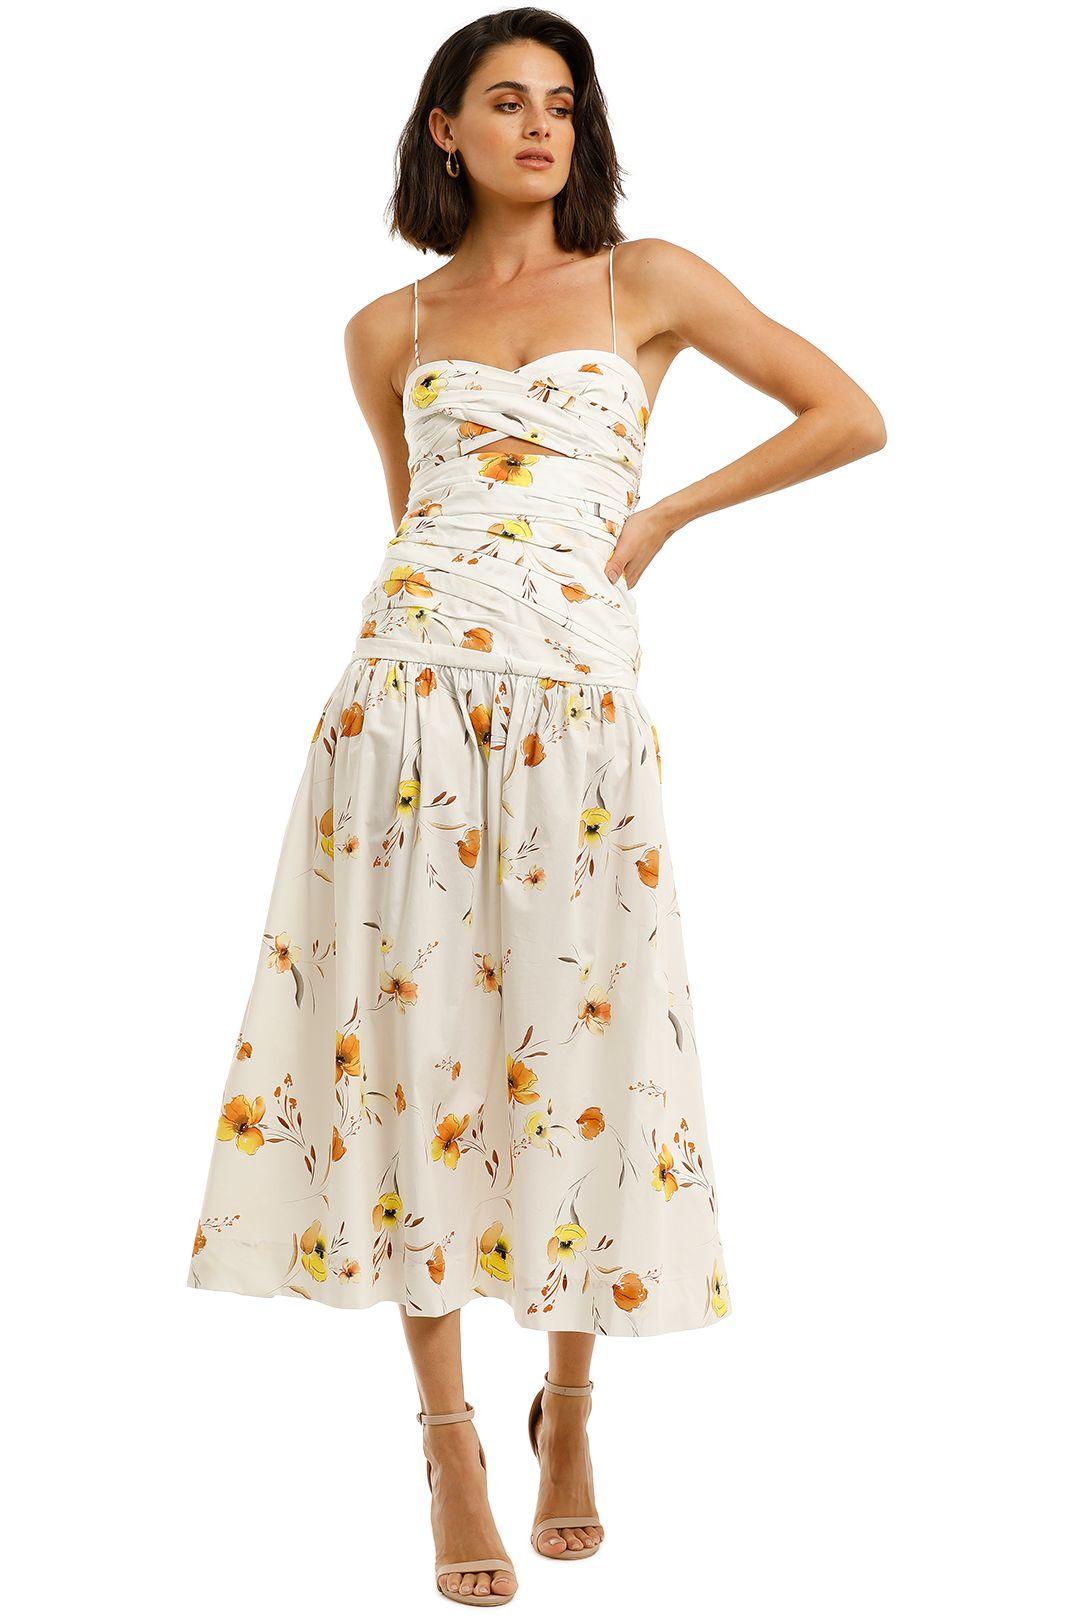 Bec-and-Bridge-Colette-Midi-Dress-Front